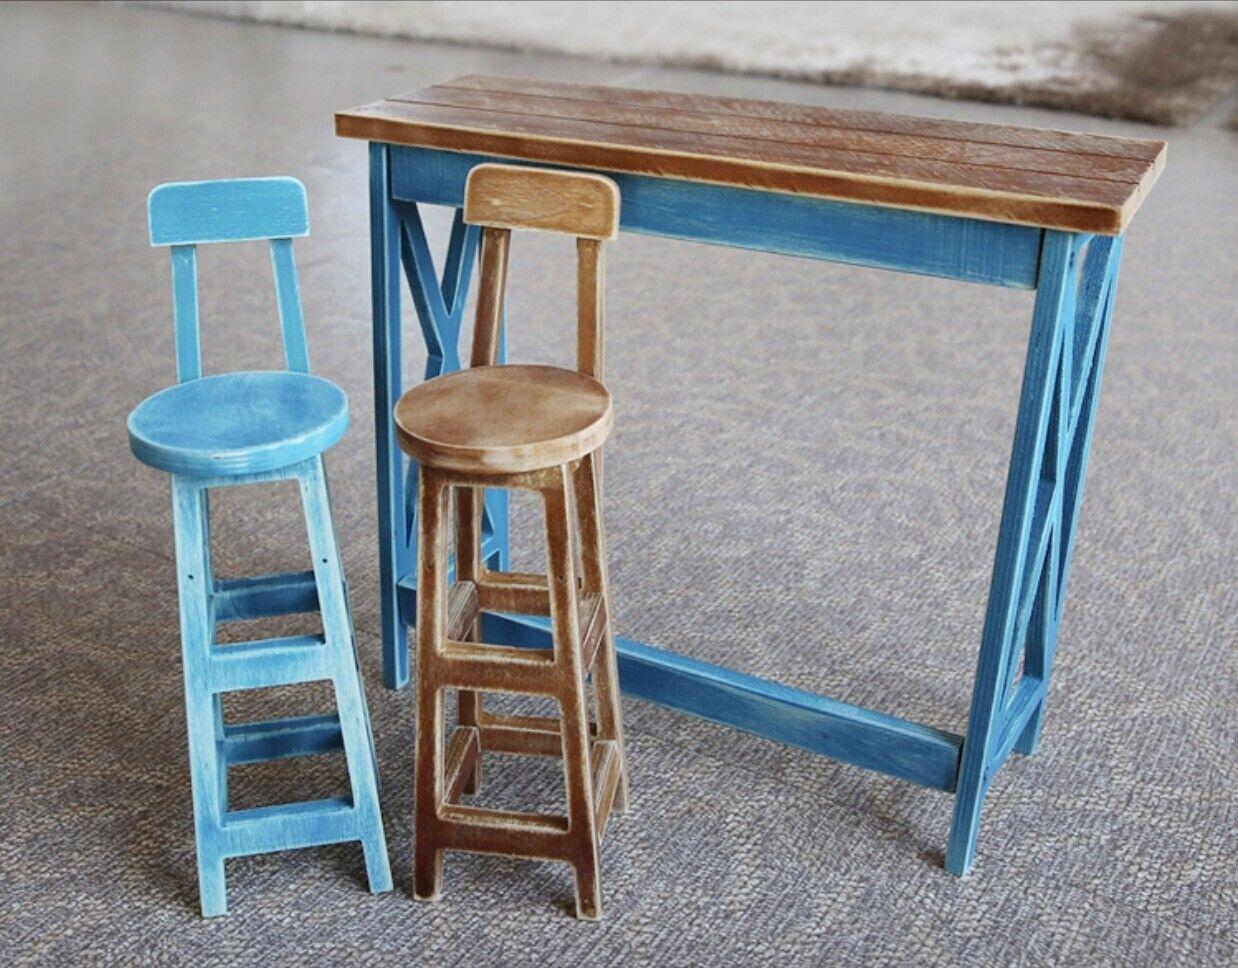 Mini Mesa De Madera Para Muebles taburetes para 1 3 60cm 70cm SD SD17 BJD MSD LUTS dk Nuevo